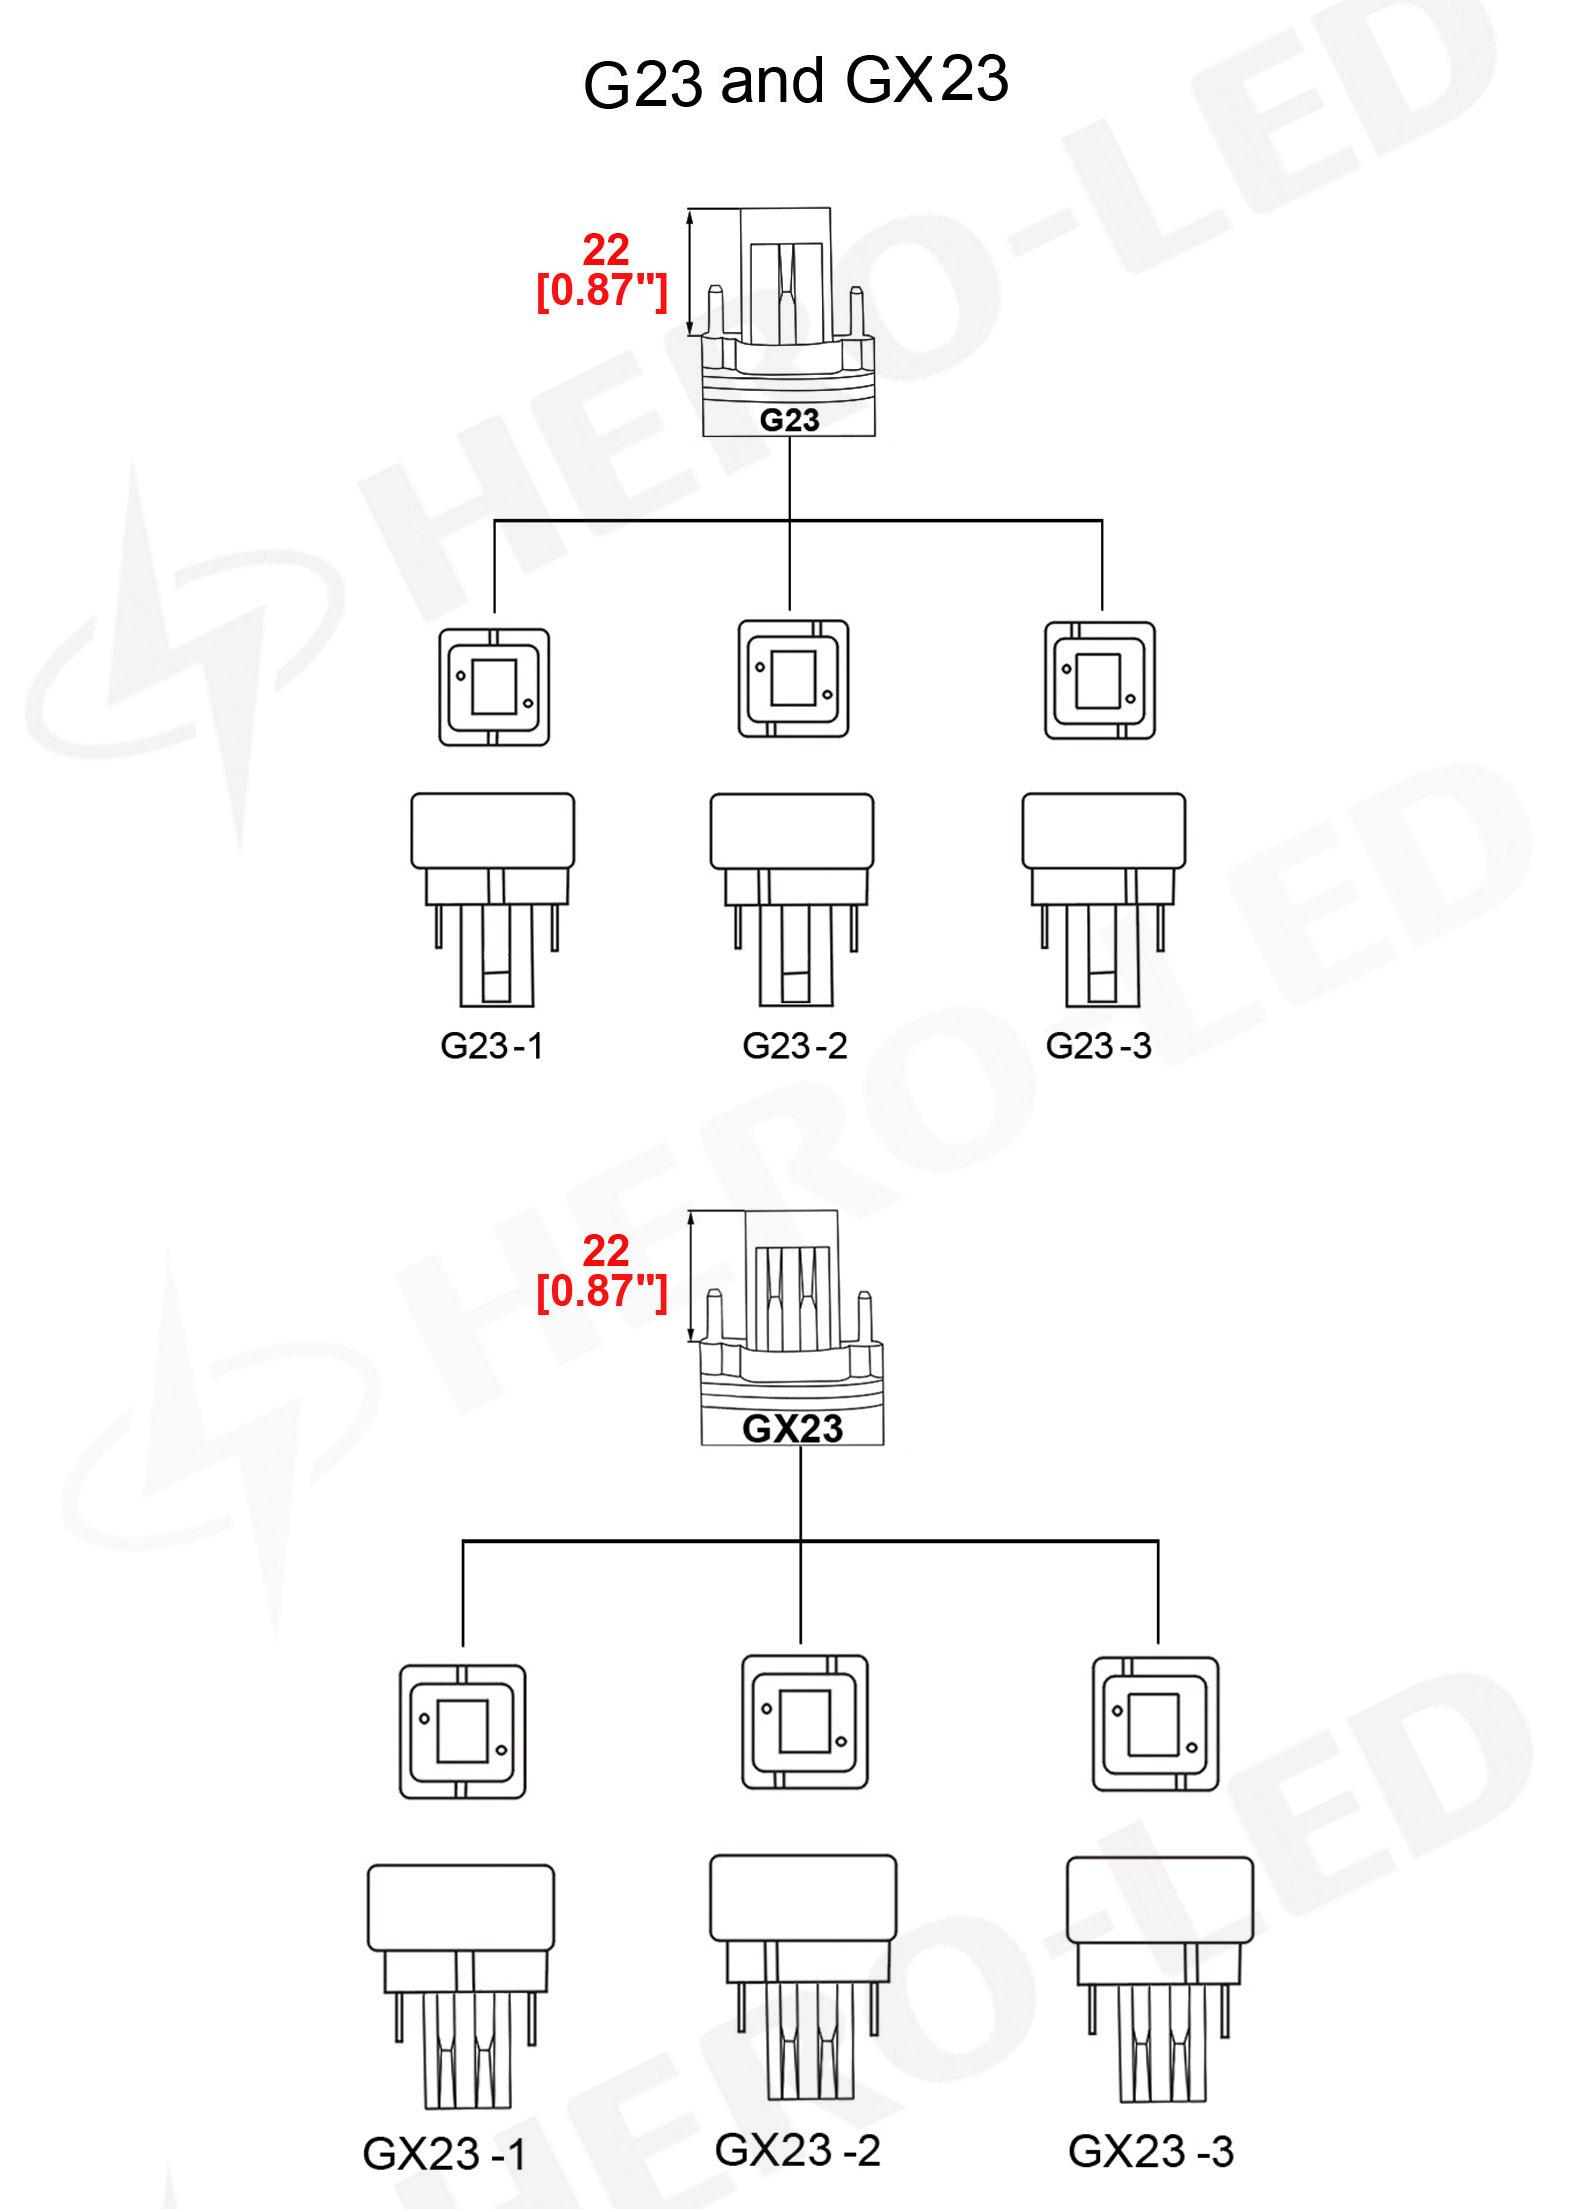 lennox furnace wiring diagram 16 g